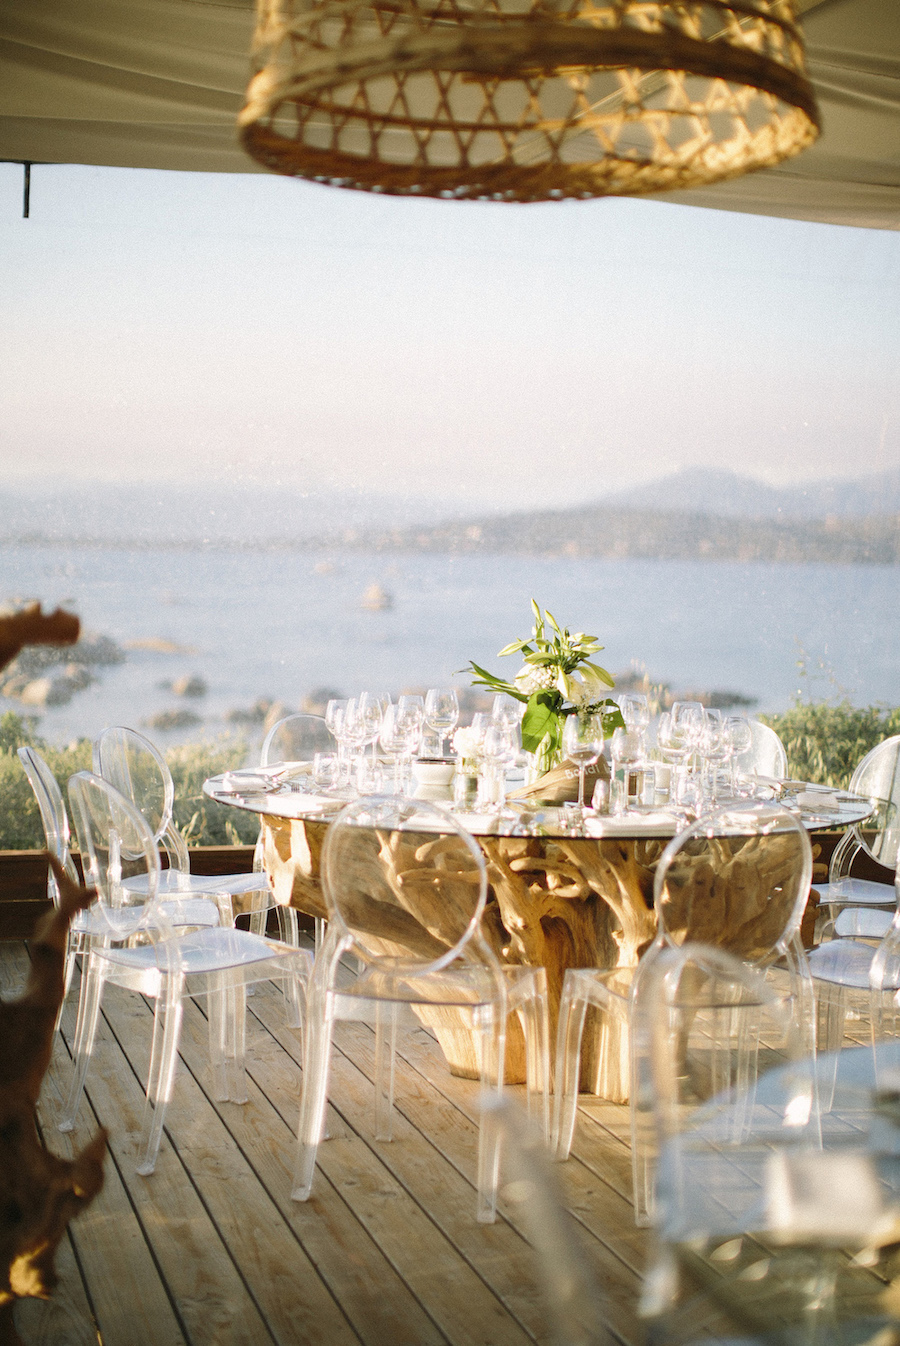 saya-photography-wedding-mariage-corse-corsica146.jpg